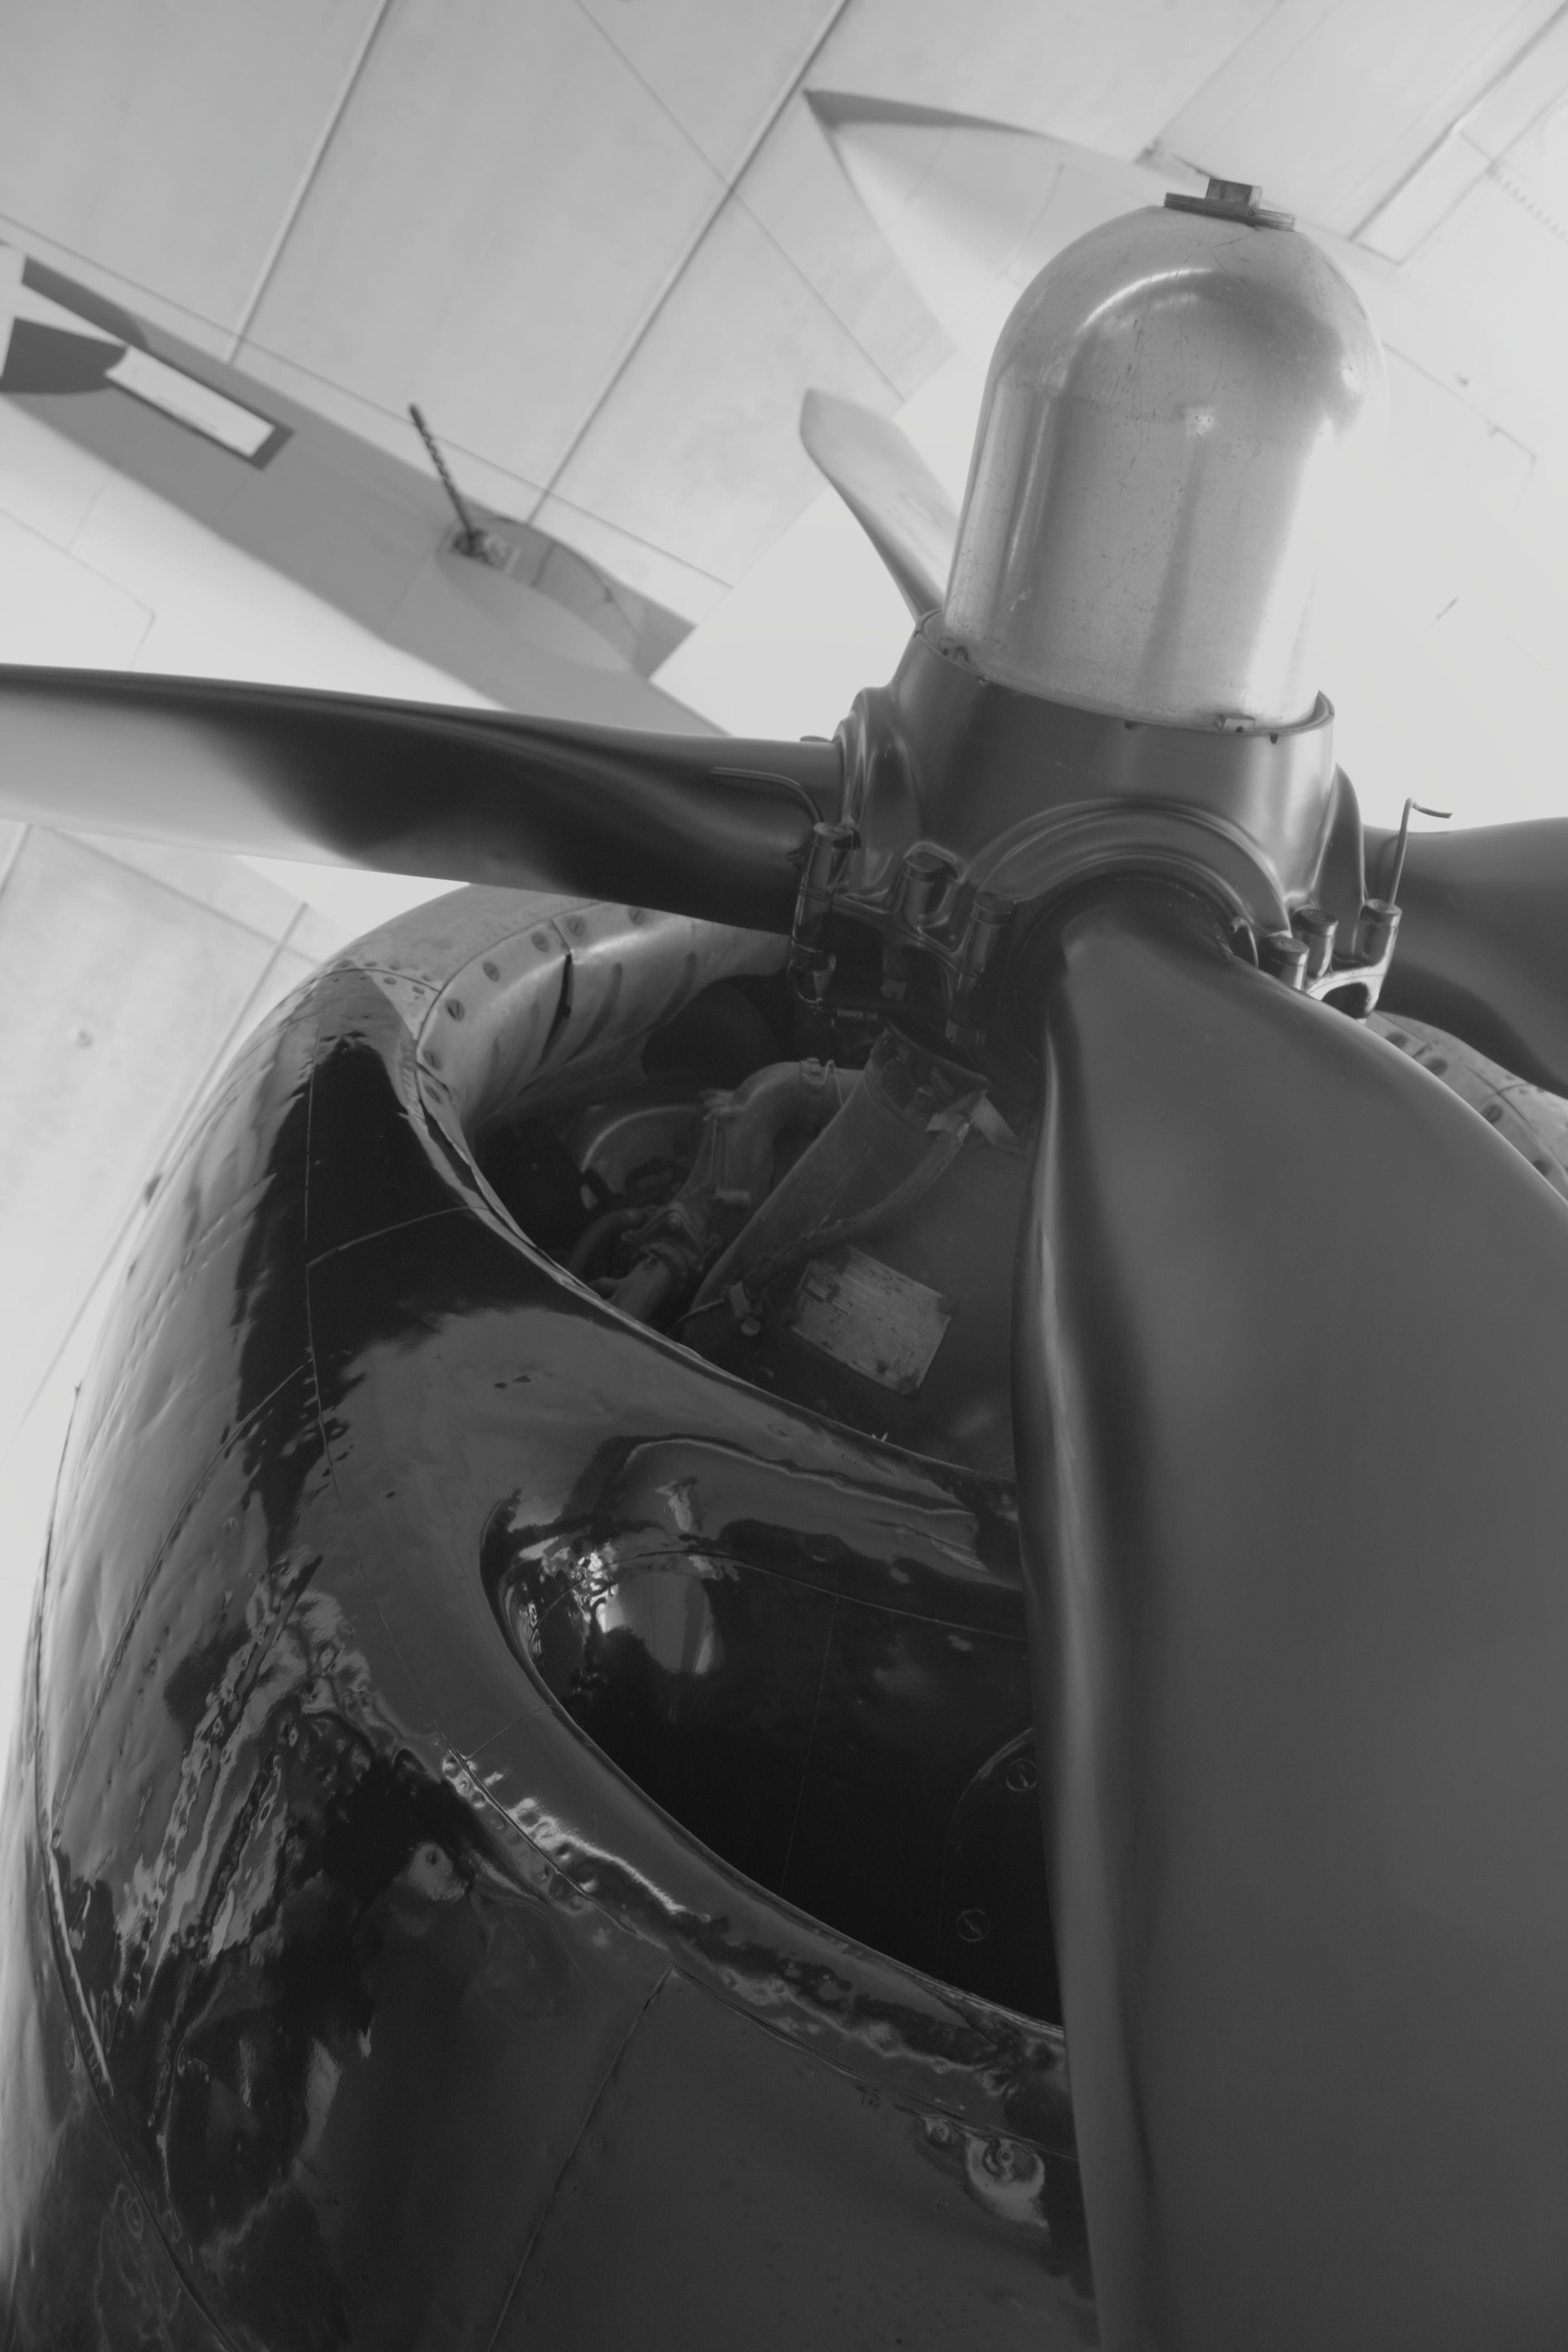 Free stock photo of plane, plane engine